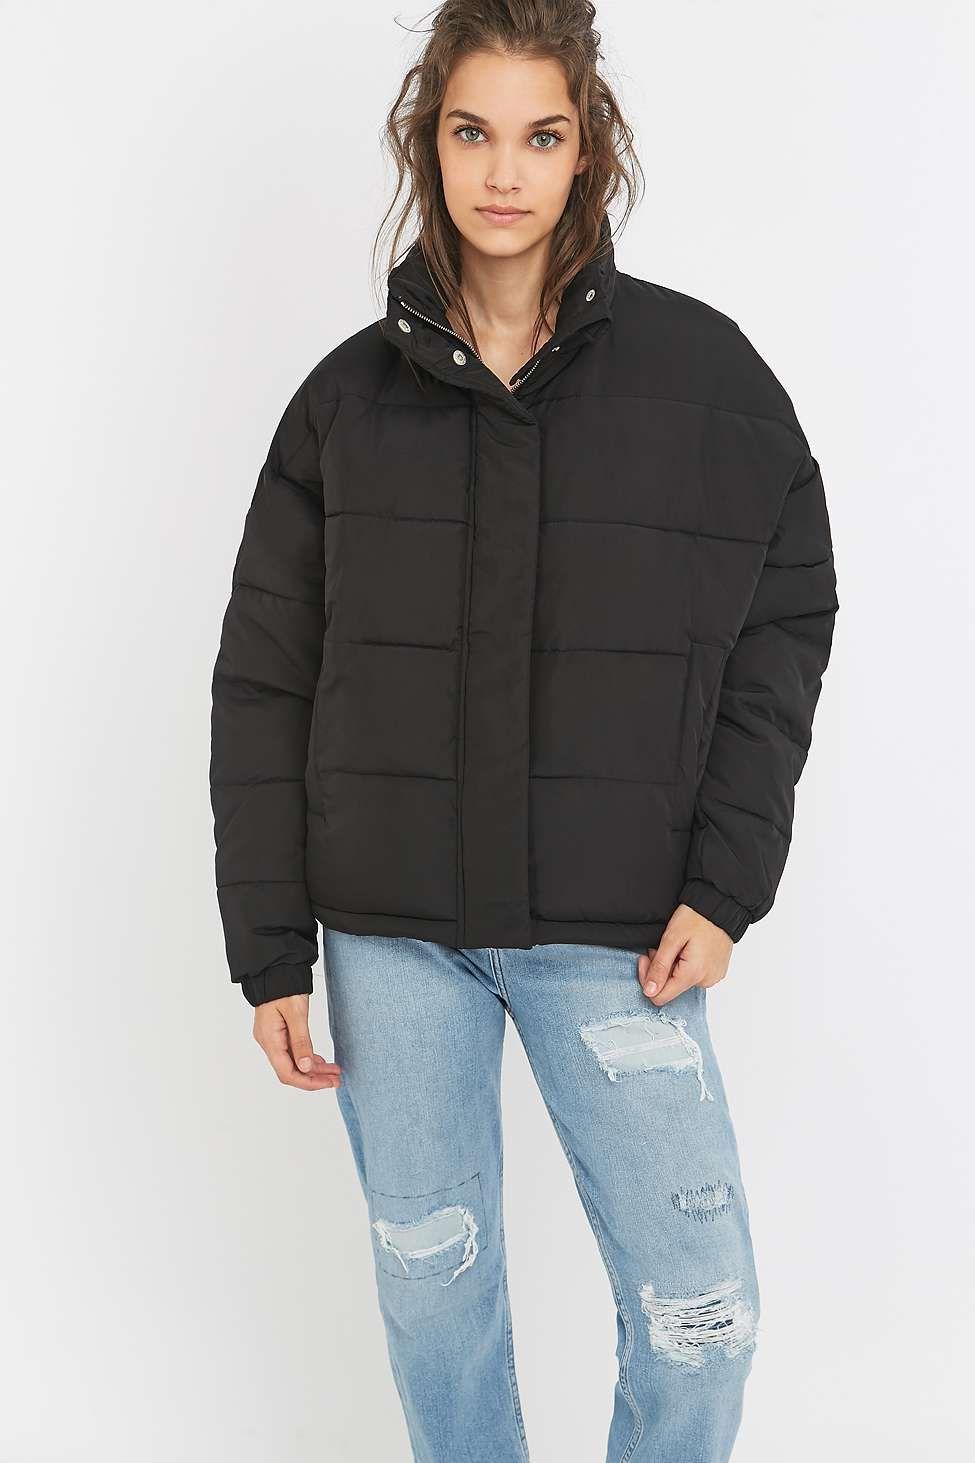 Light Before Dark Cropped Puffer Jacket   Puffer jackets ...